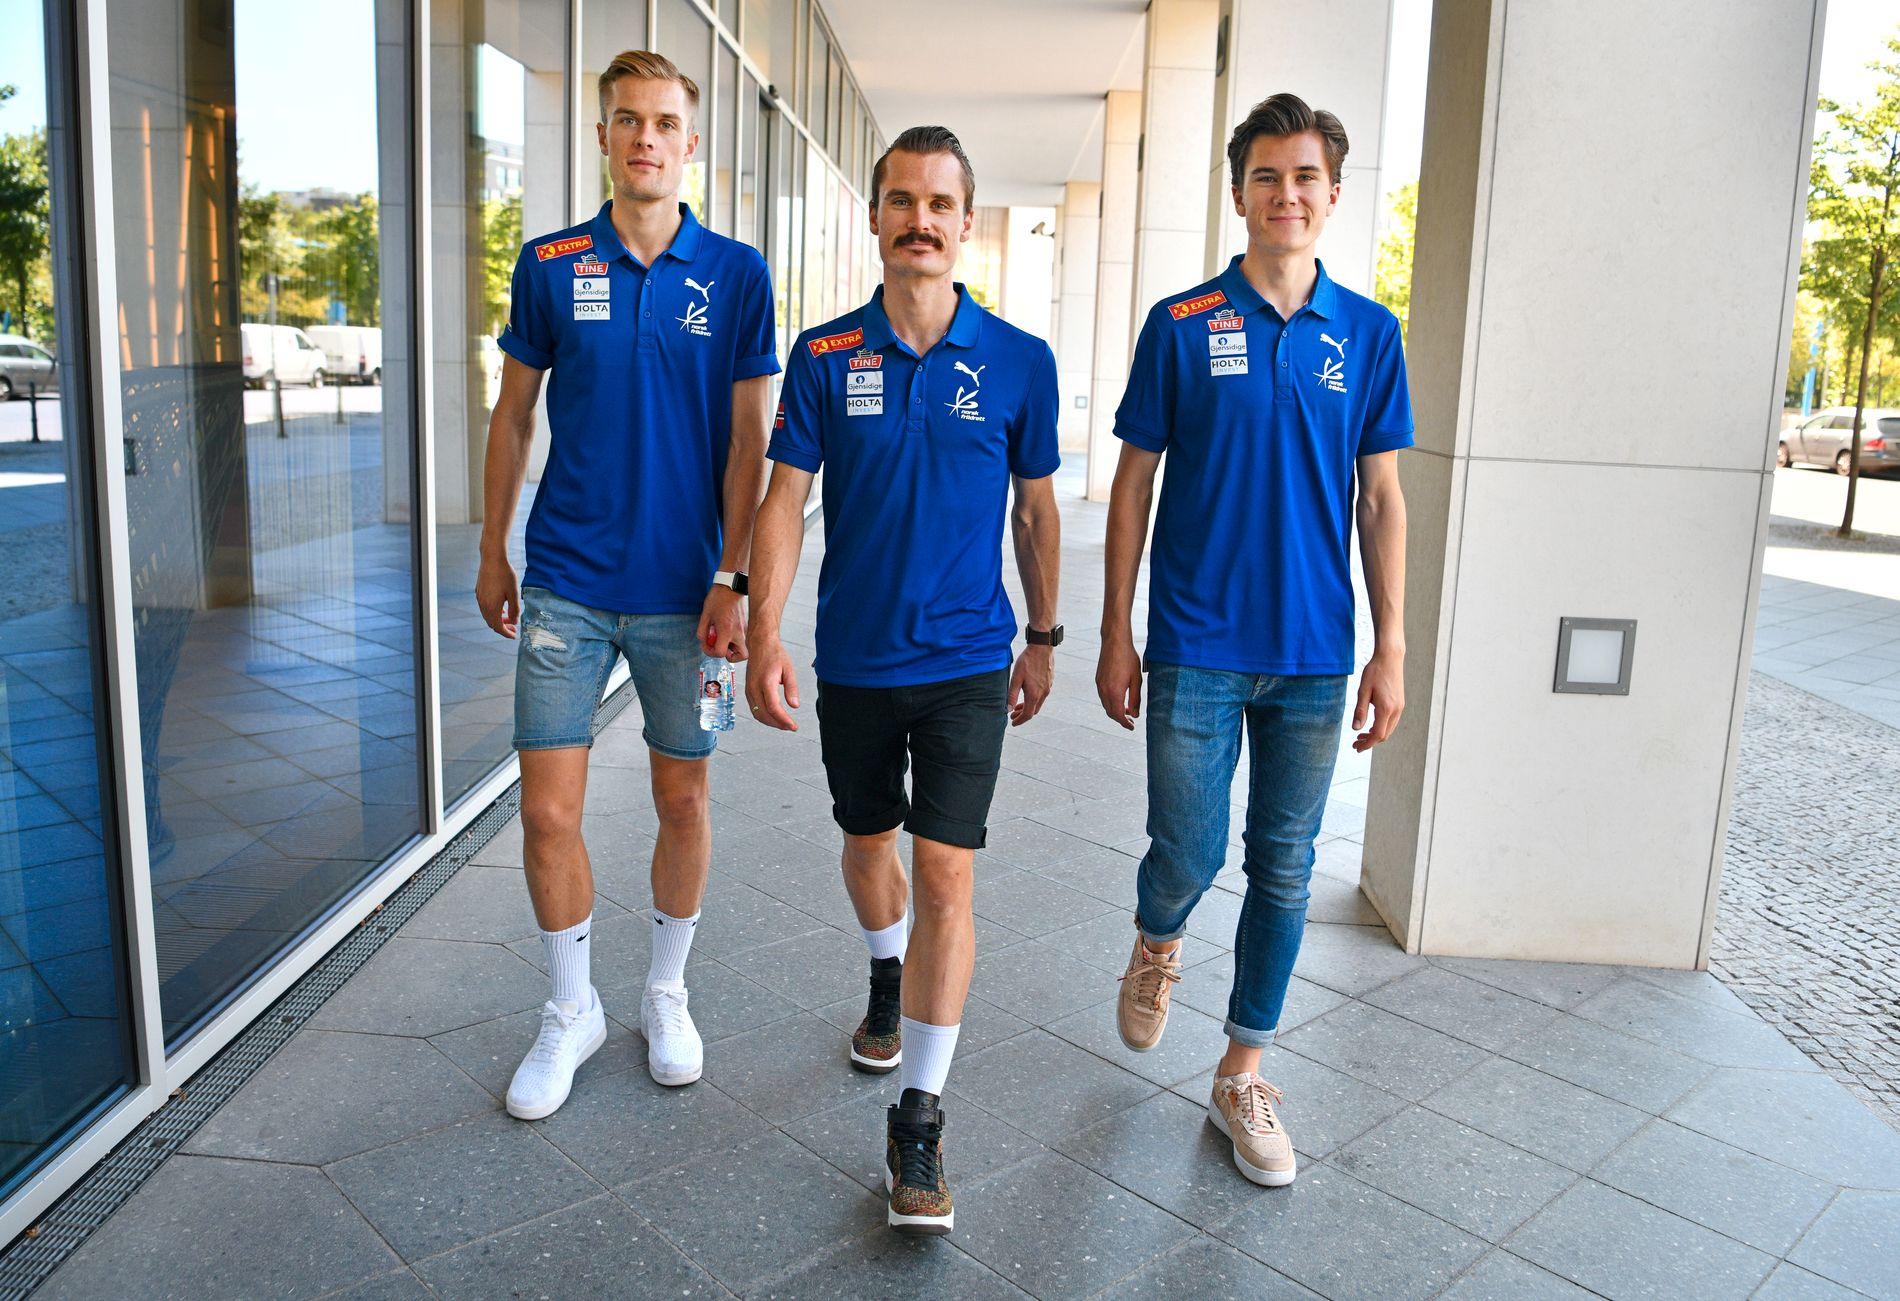 BRØDRE-TRIO: Fra v.: Filip, Henrik og Jakob Ingebrigtsen.